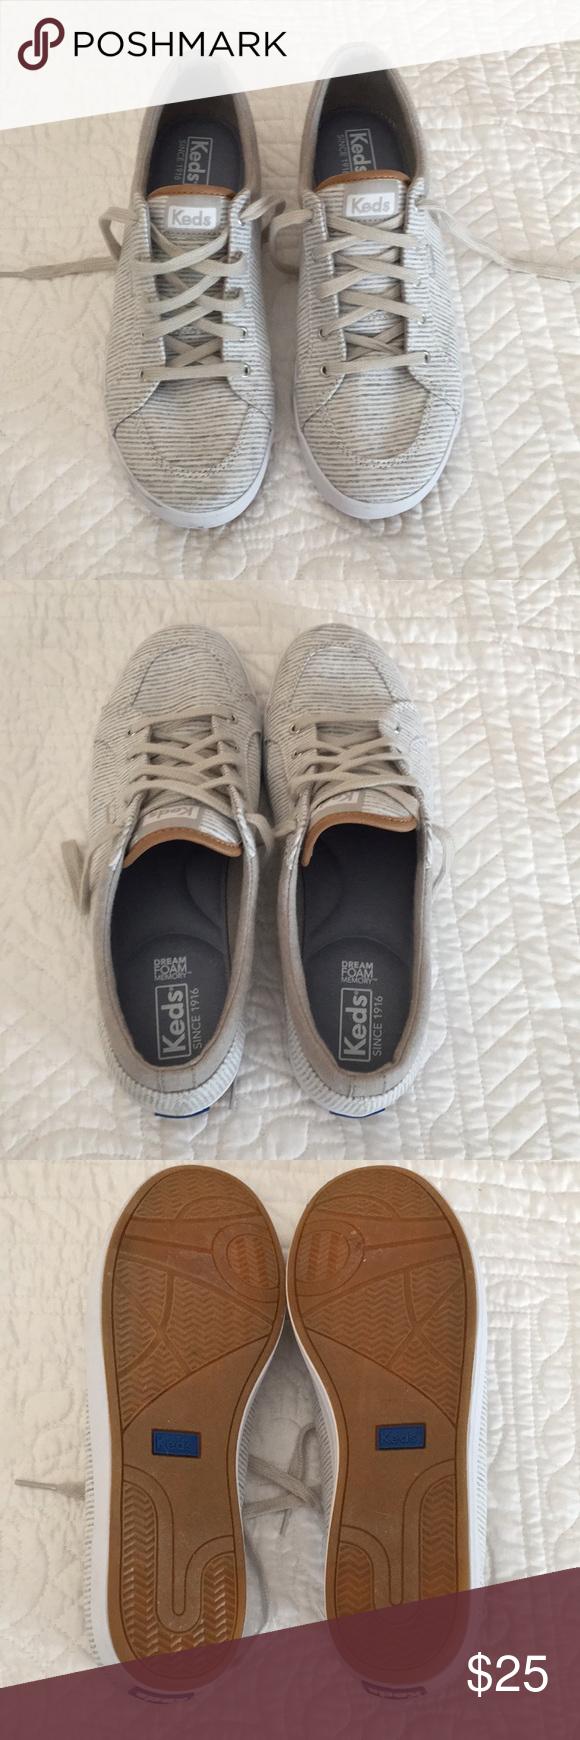 Keds Memory Foam   Keds, Keds shoes